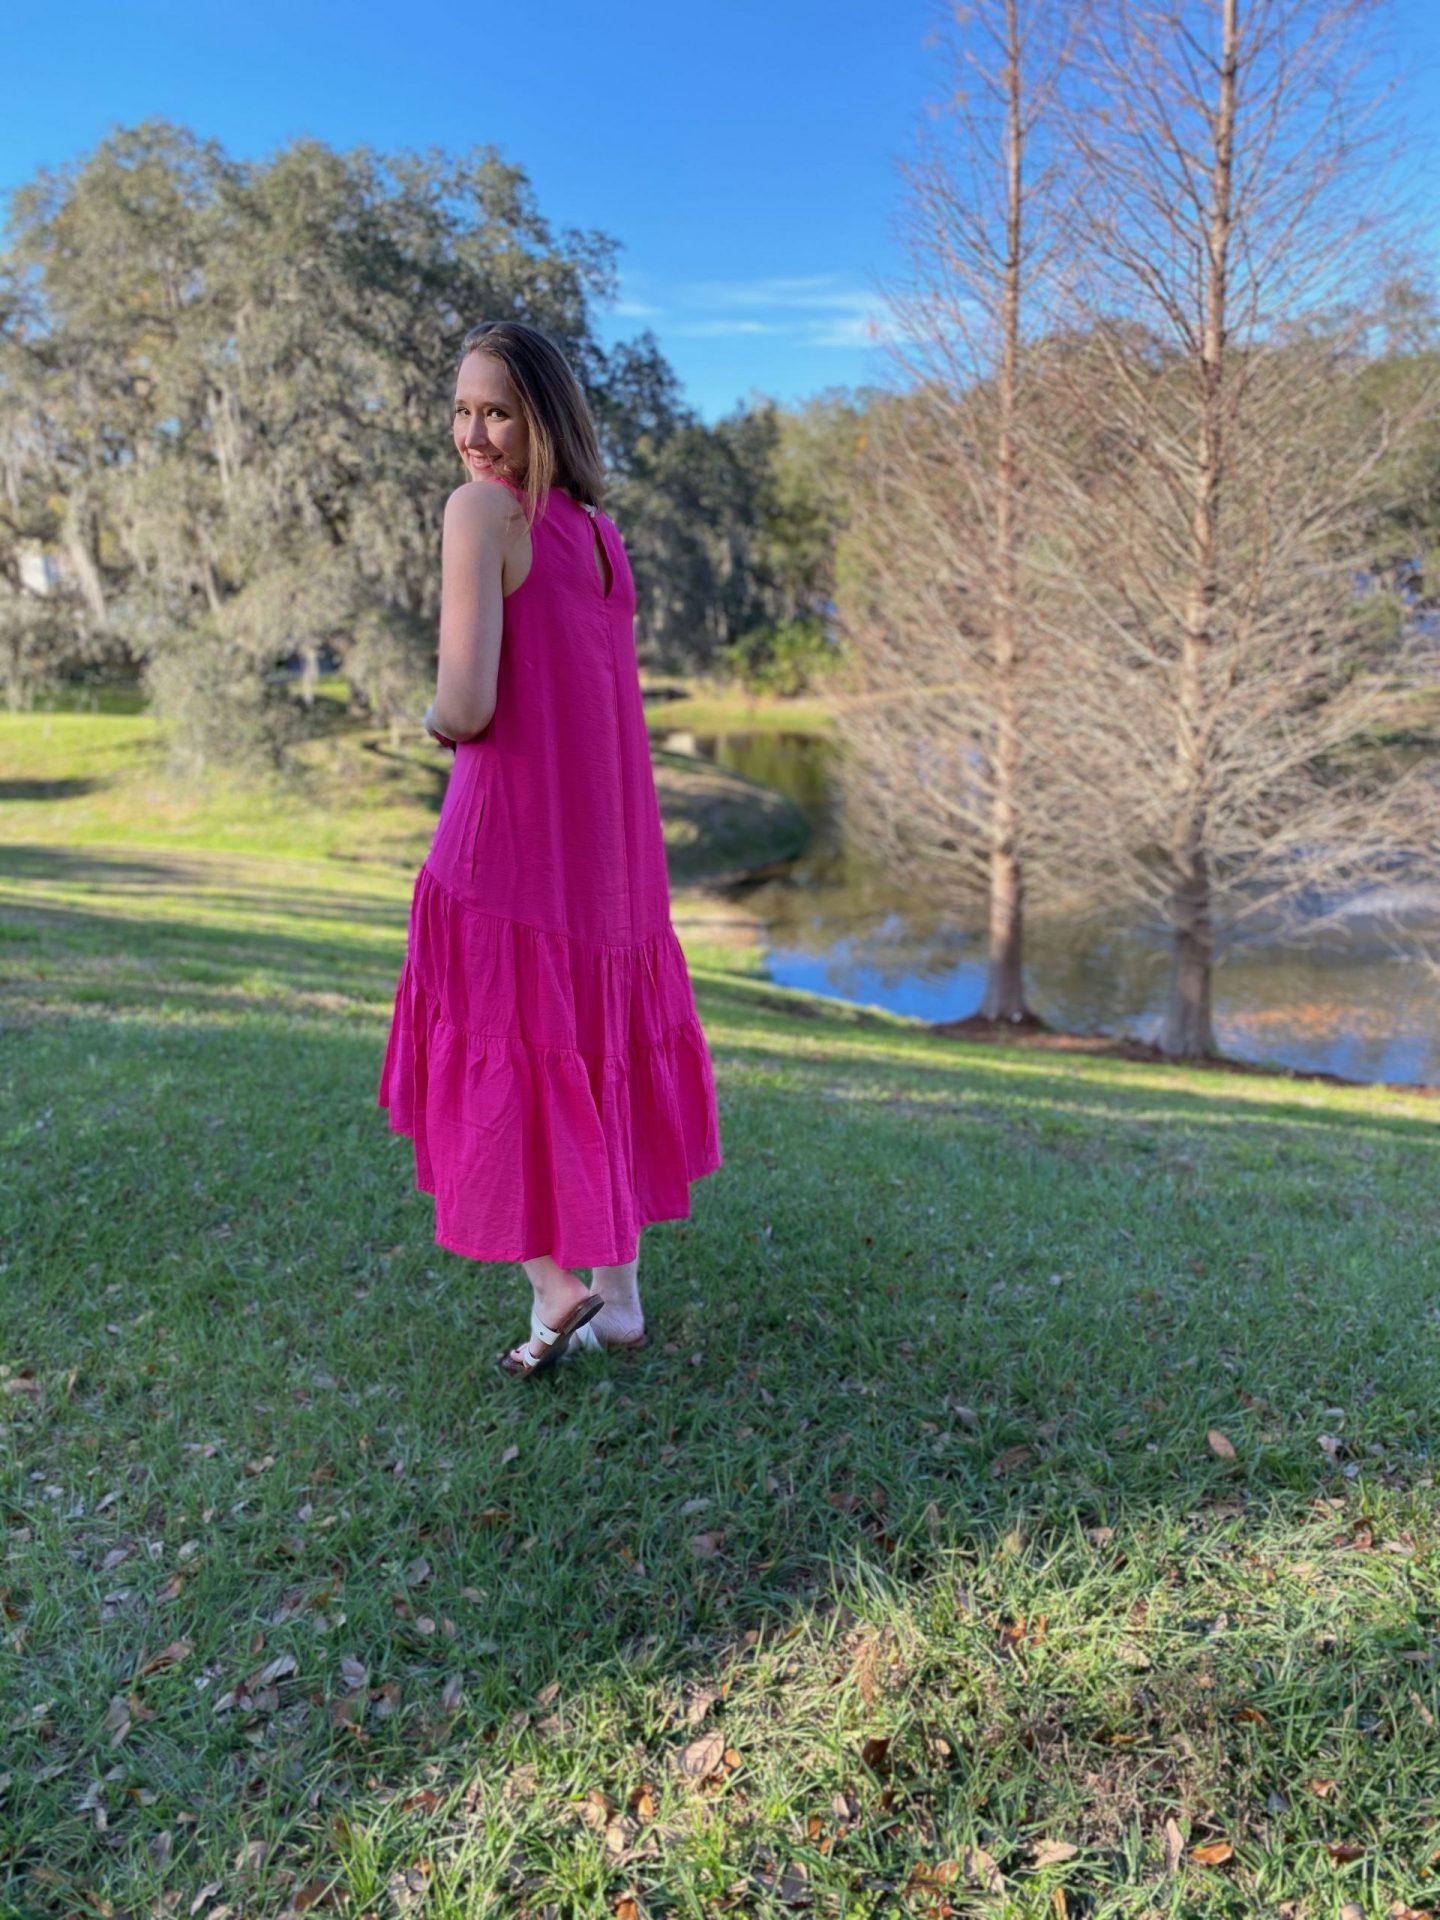 Summer Tiered Dress Style Ideas | The Spectacular Adventurer